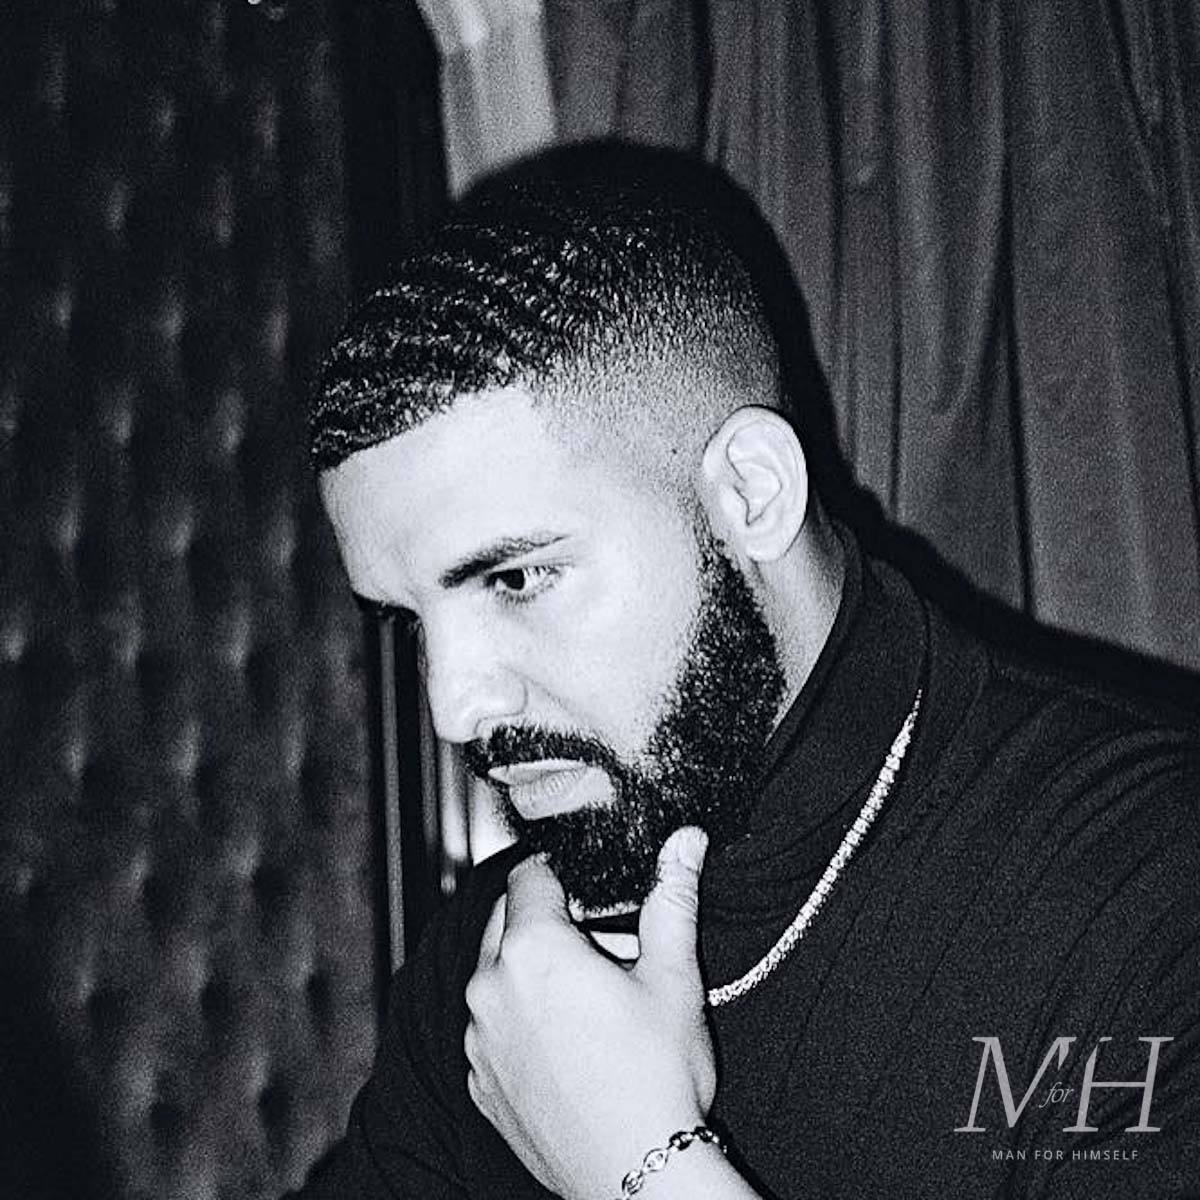 drake-champagnepapi-hairstyle-mens-haircut-buzz-cut-MFHC11-Man-For-Himself